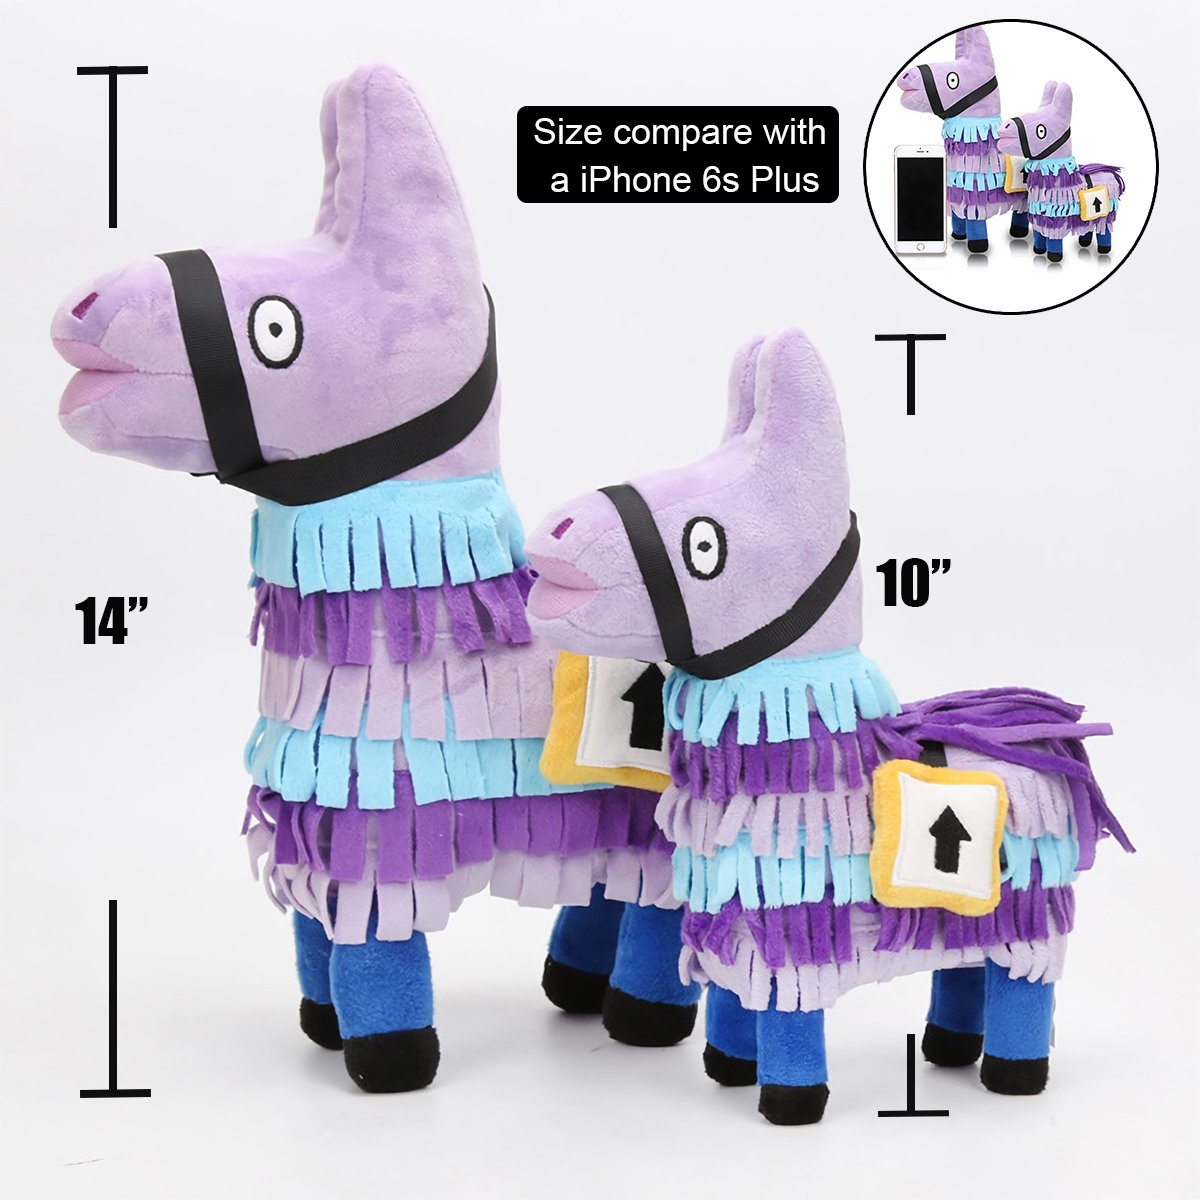 fortnite llama plush figure 14 video game fortnite troll stash llama stuffed toy 14 inch tall mvpstore - fortnite llama cuddly toy